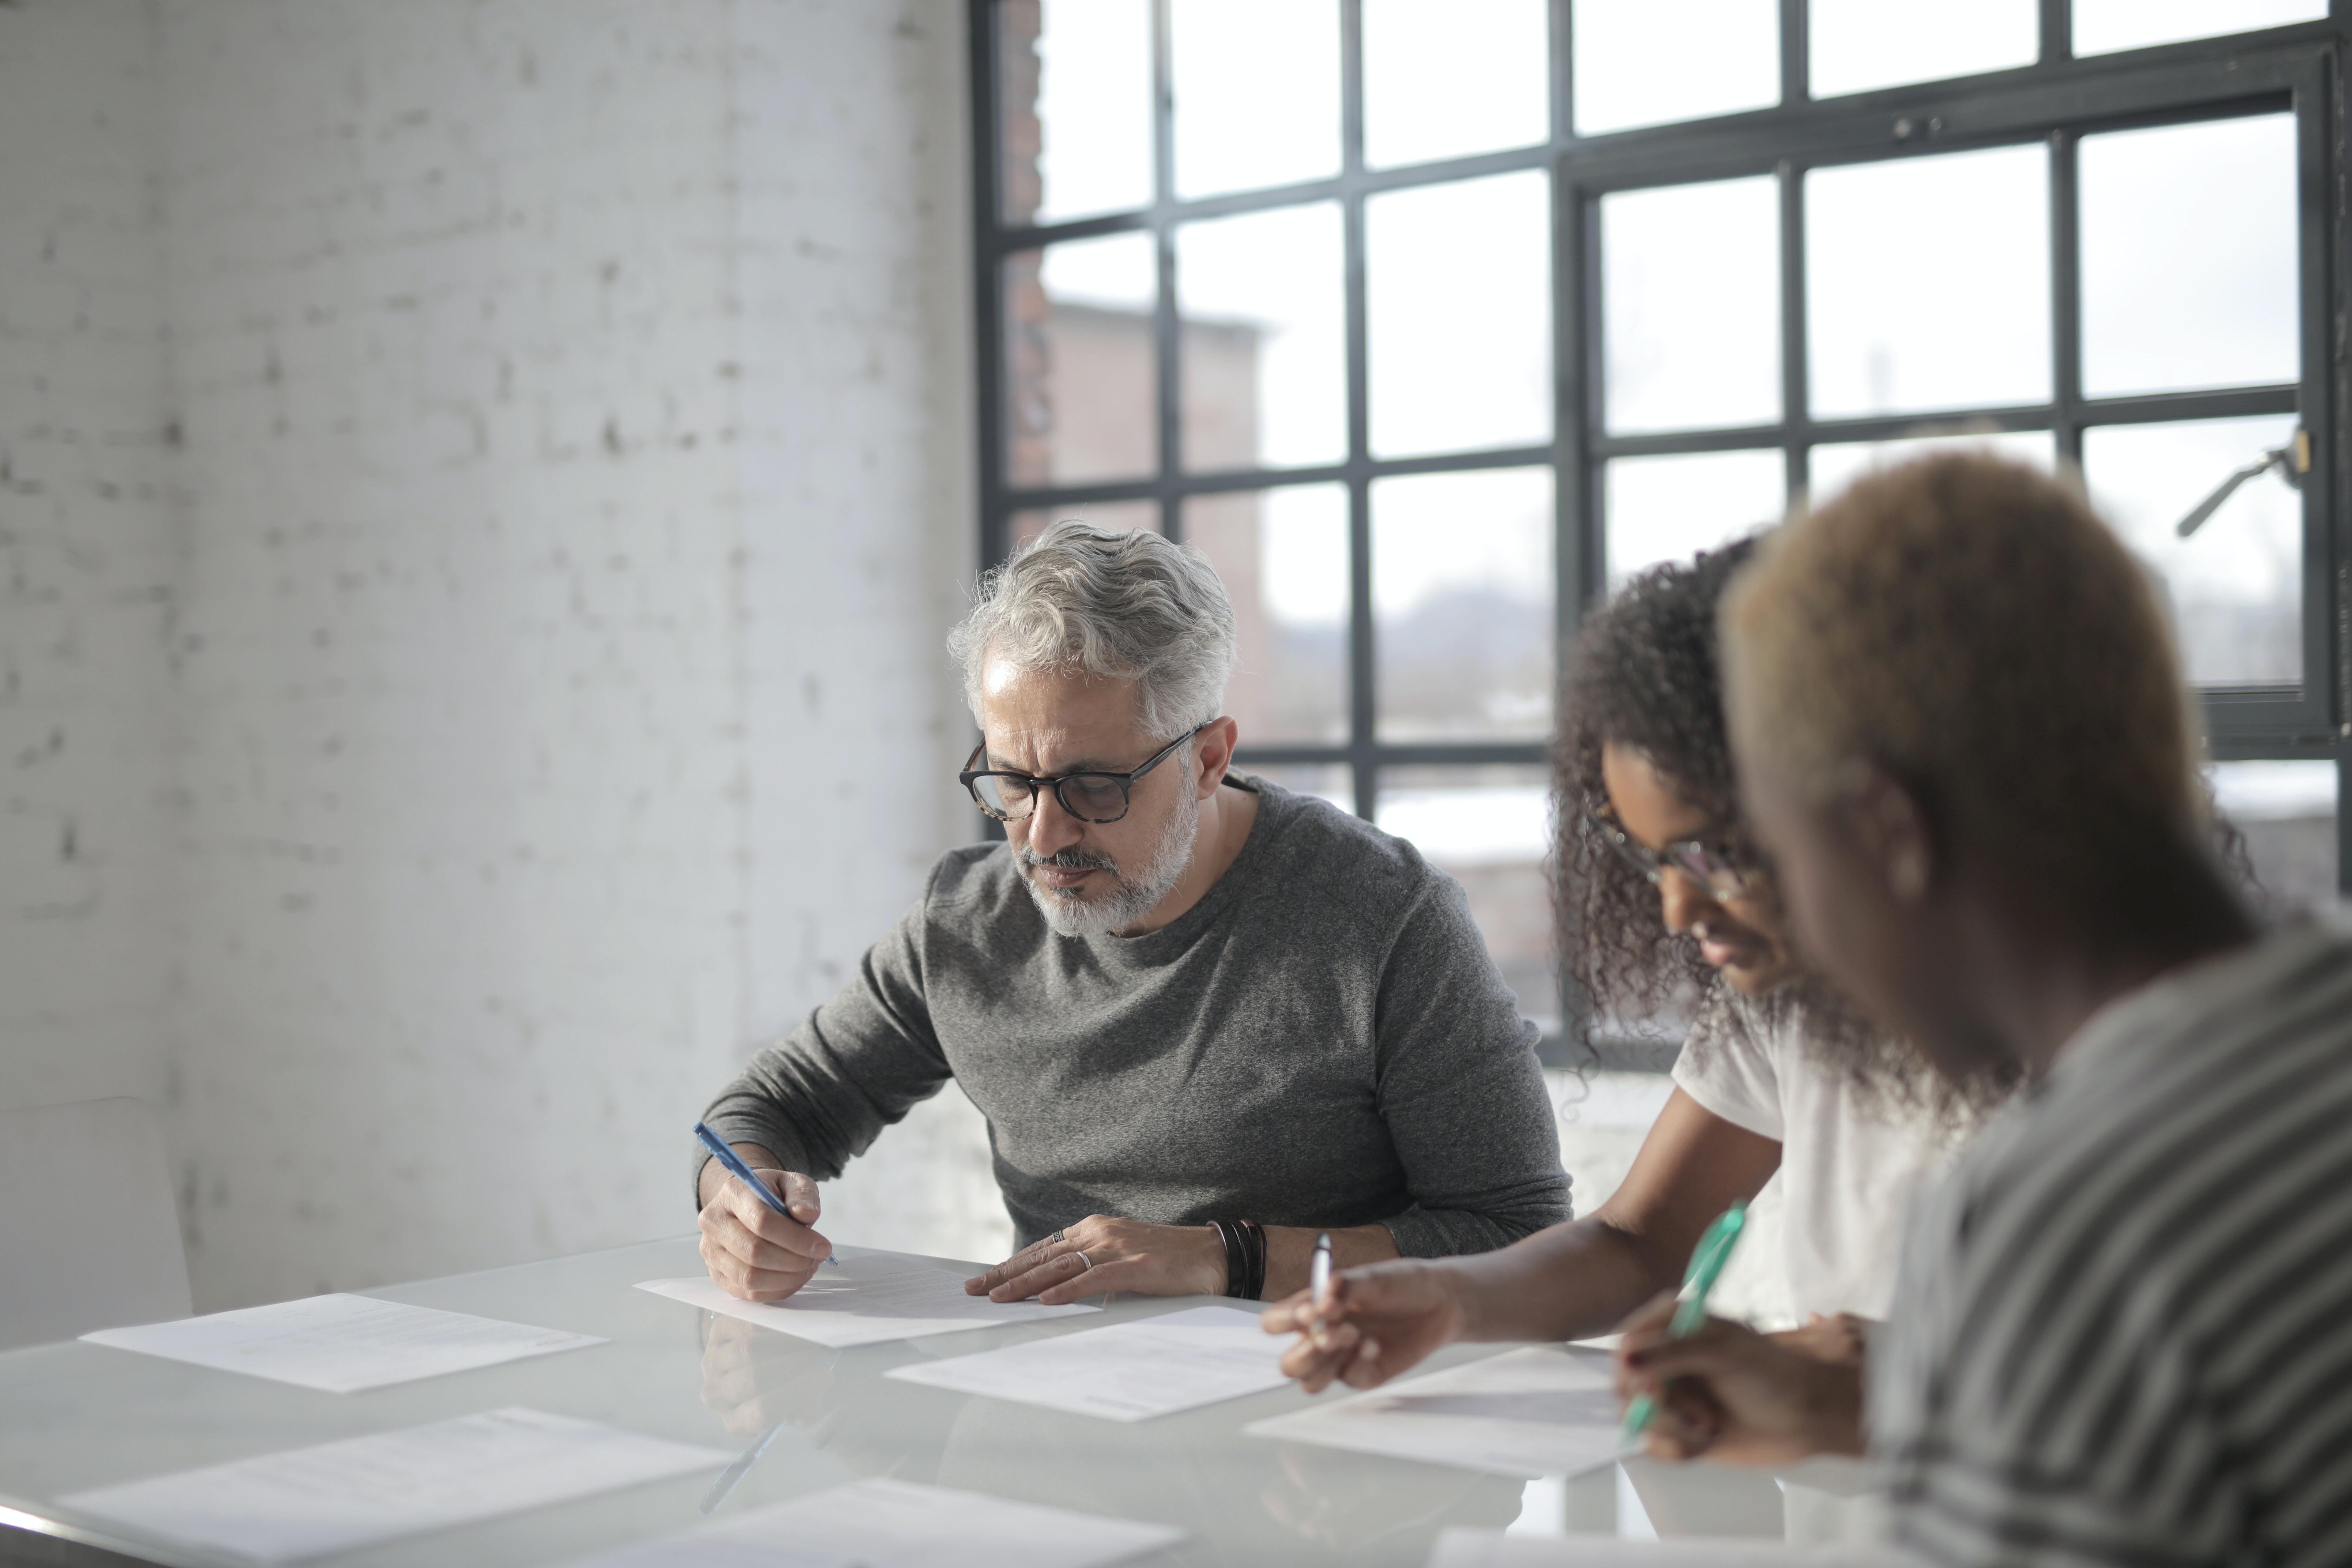 Pandemia aumenta desigualdade racial no mercado de trabalho